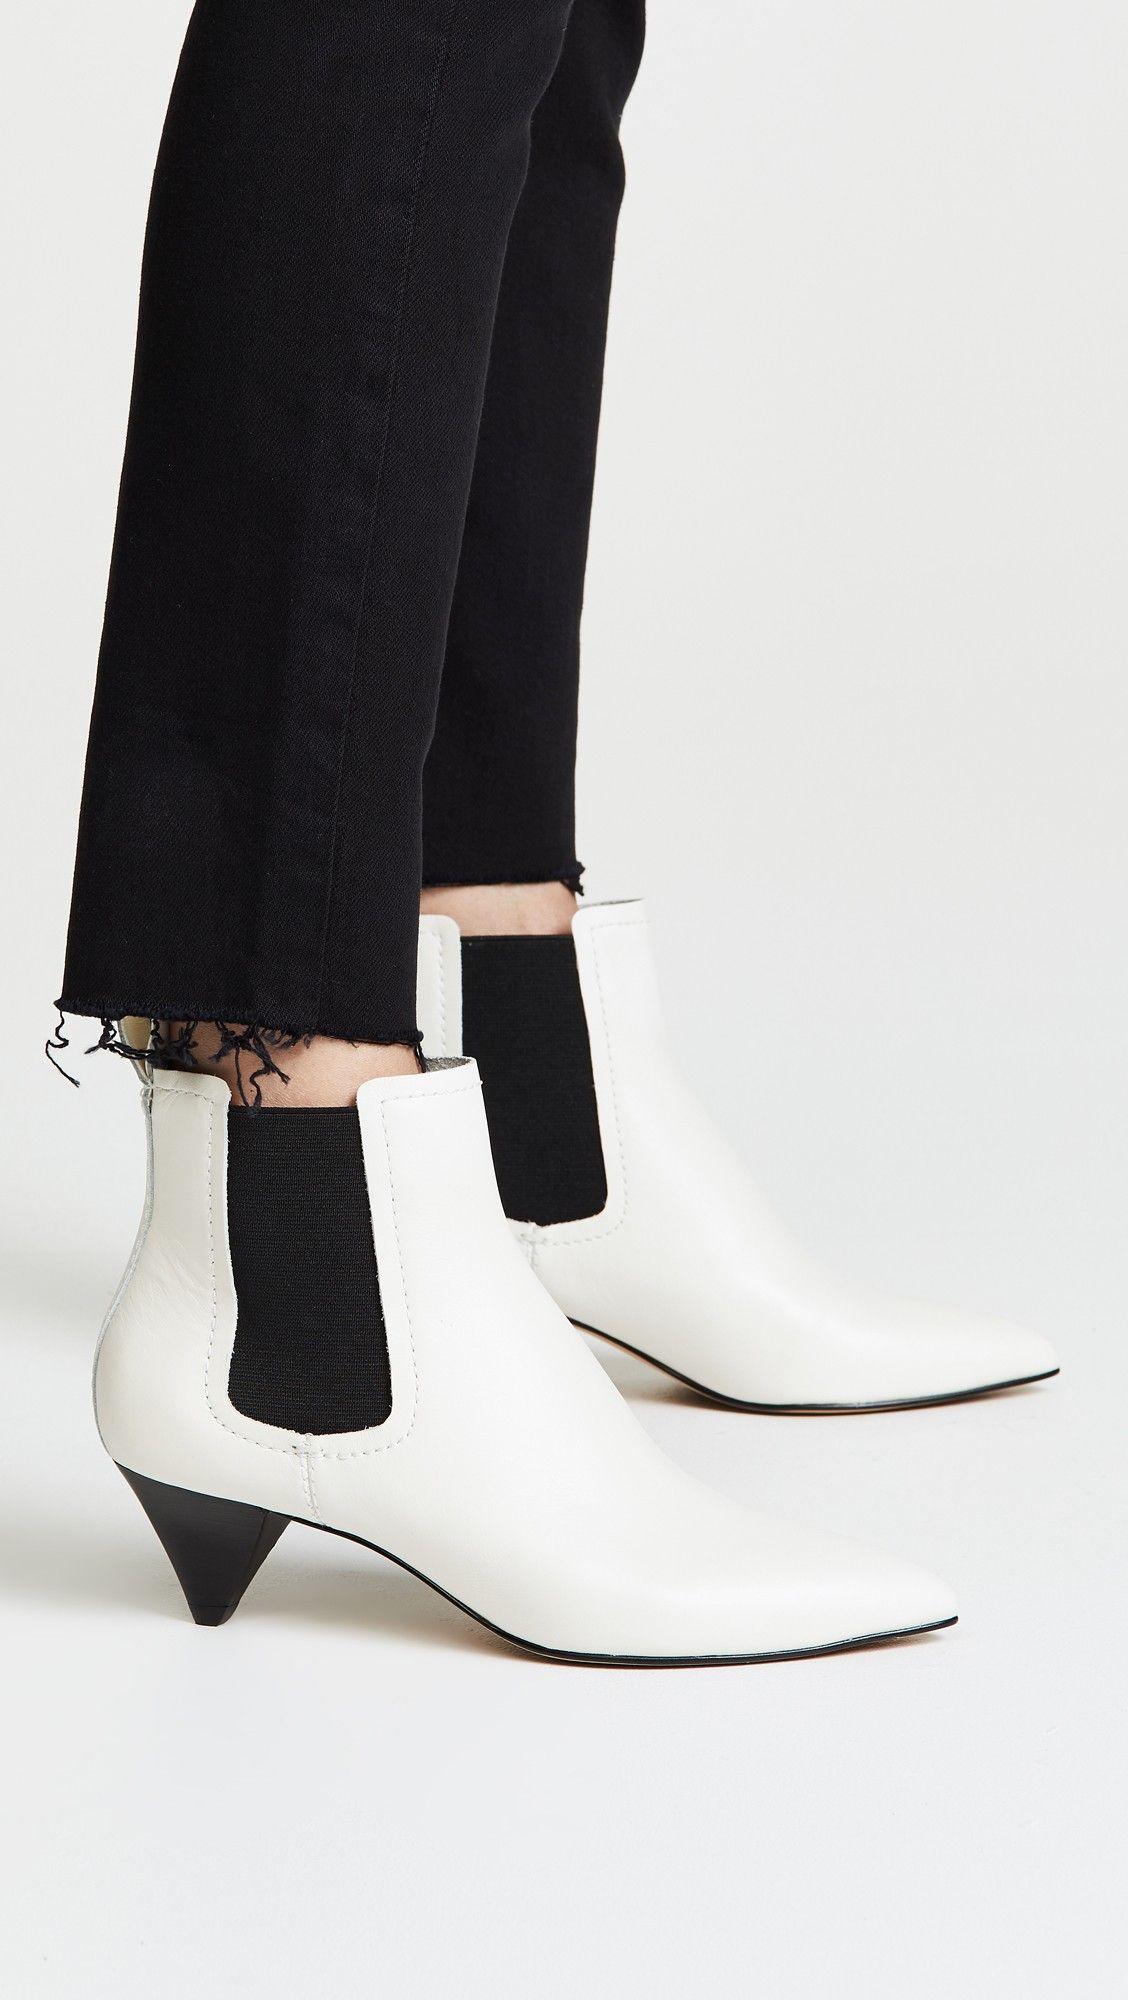 335541f115d Yorona Booties | Fashion Stuff | Dolce vita, Booty, Chelsea boots